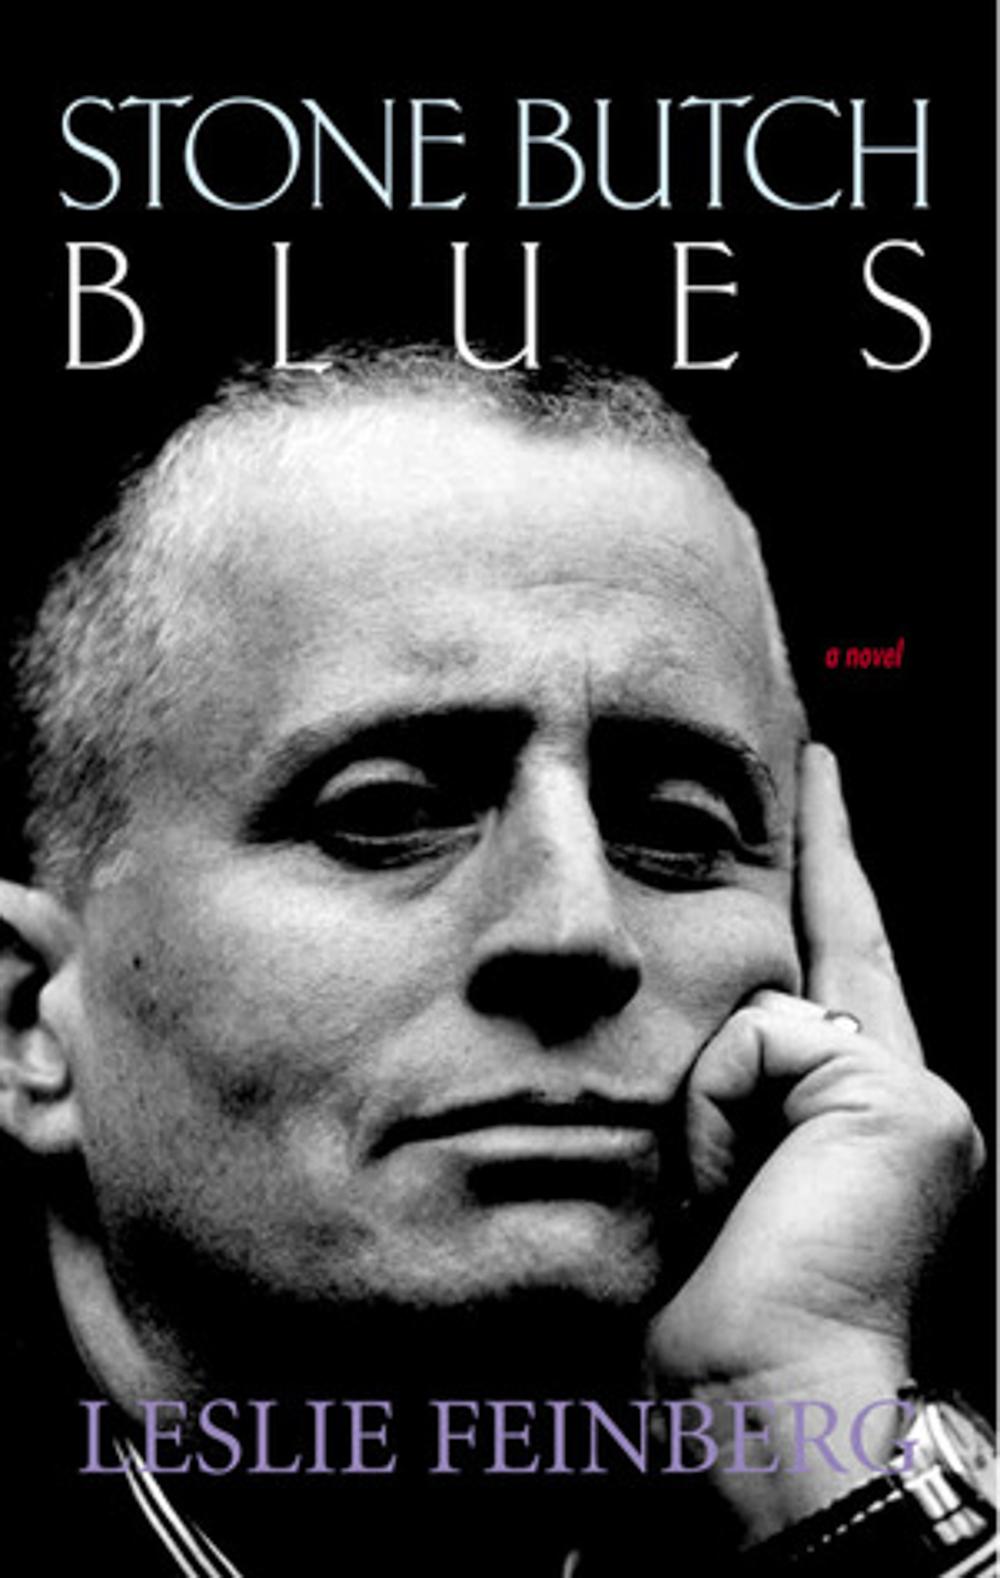 Stone Butch Blues by Leslie Feinberg